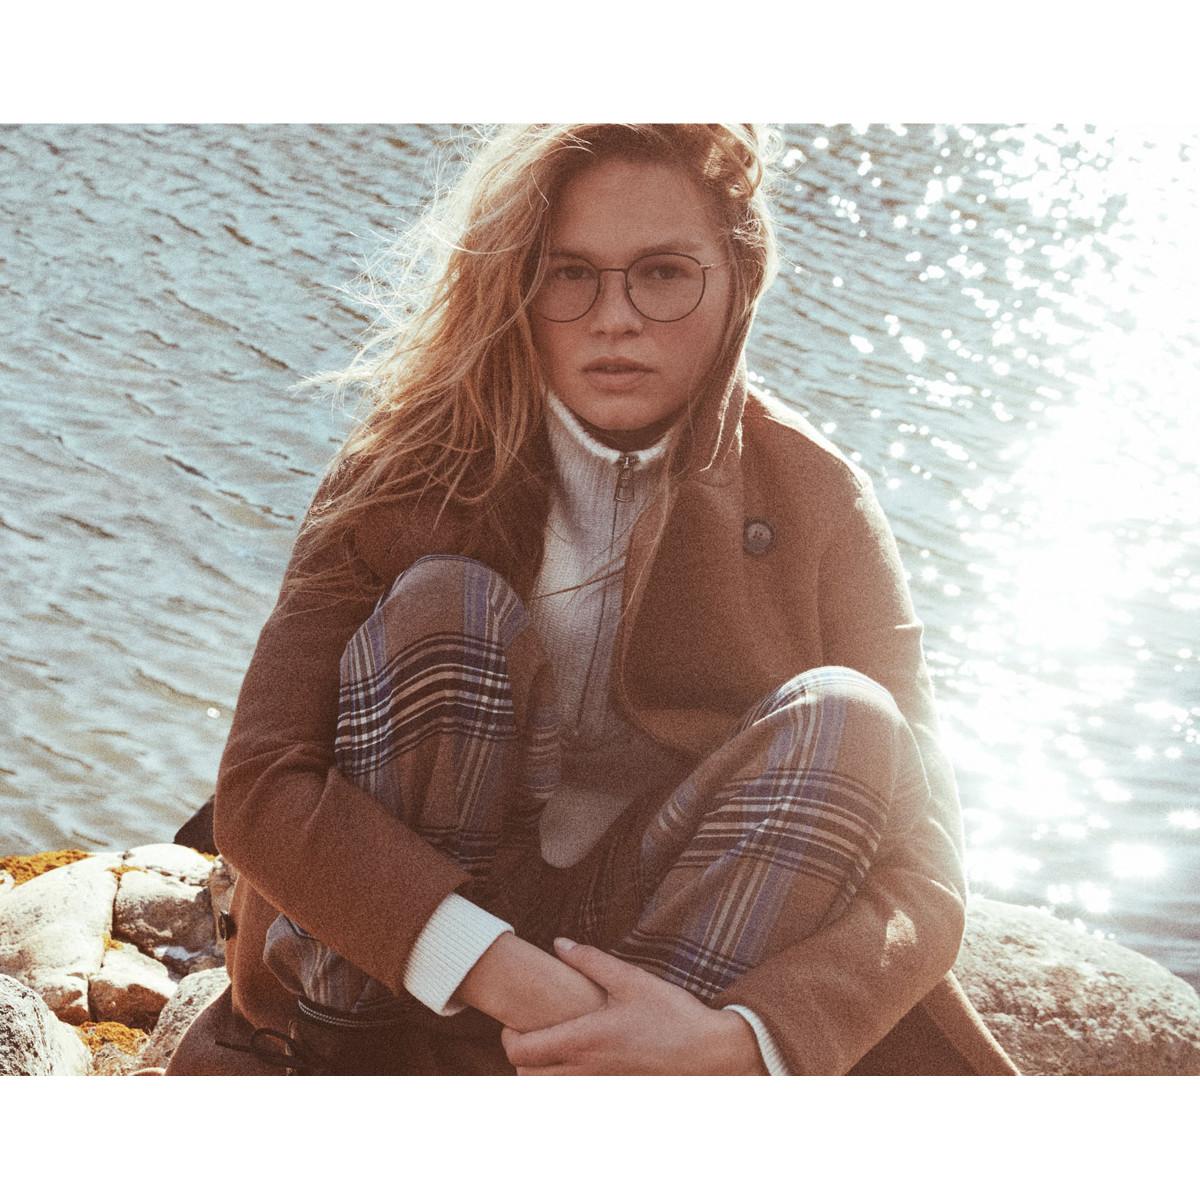 Anna Ewers | Marc O'Polo AW19 | Mikael Jansson